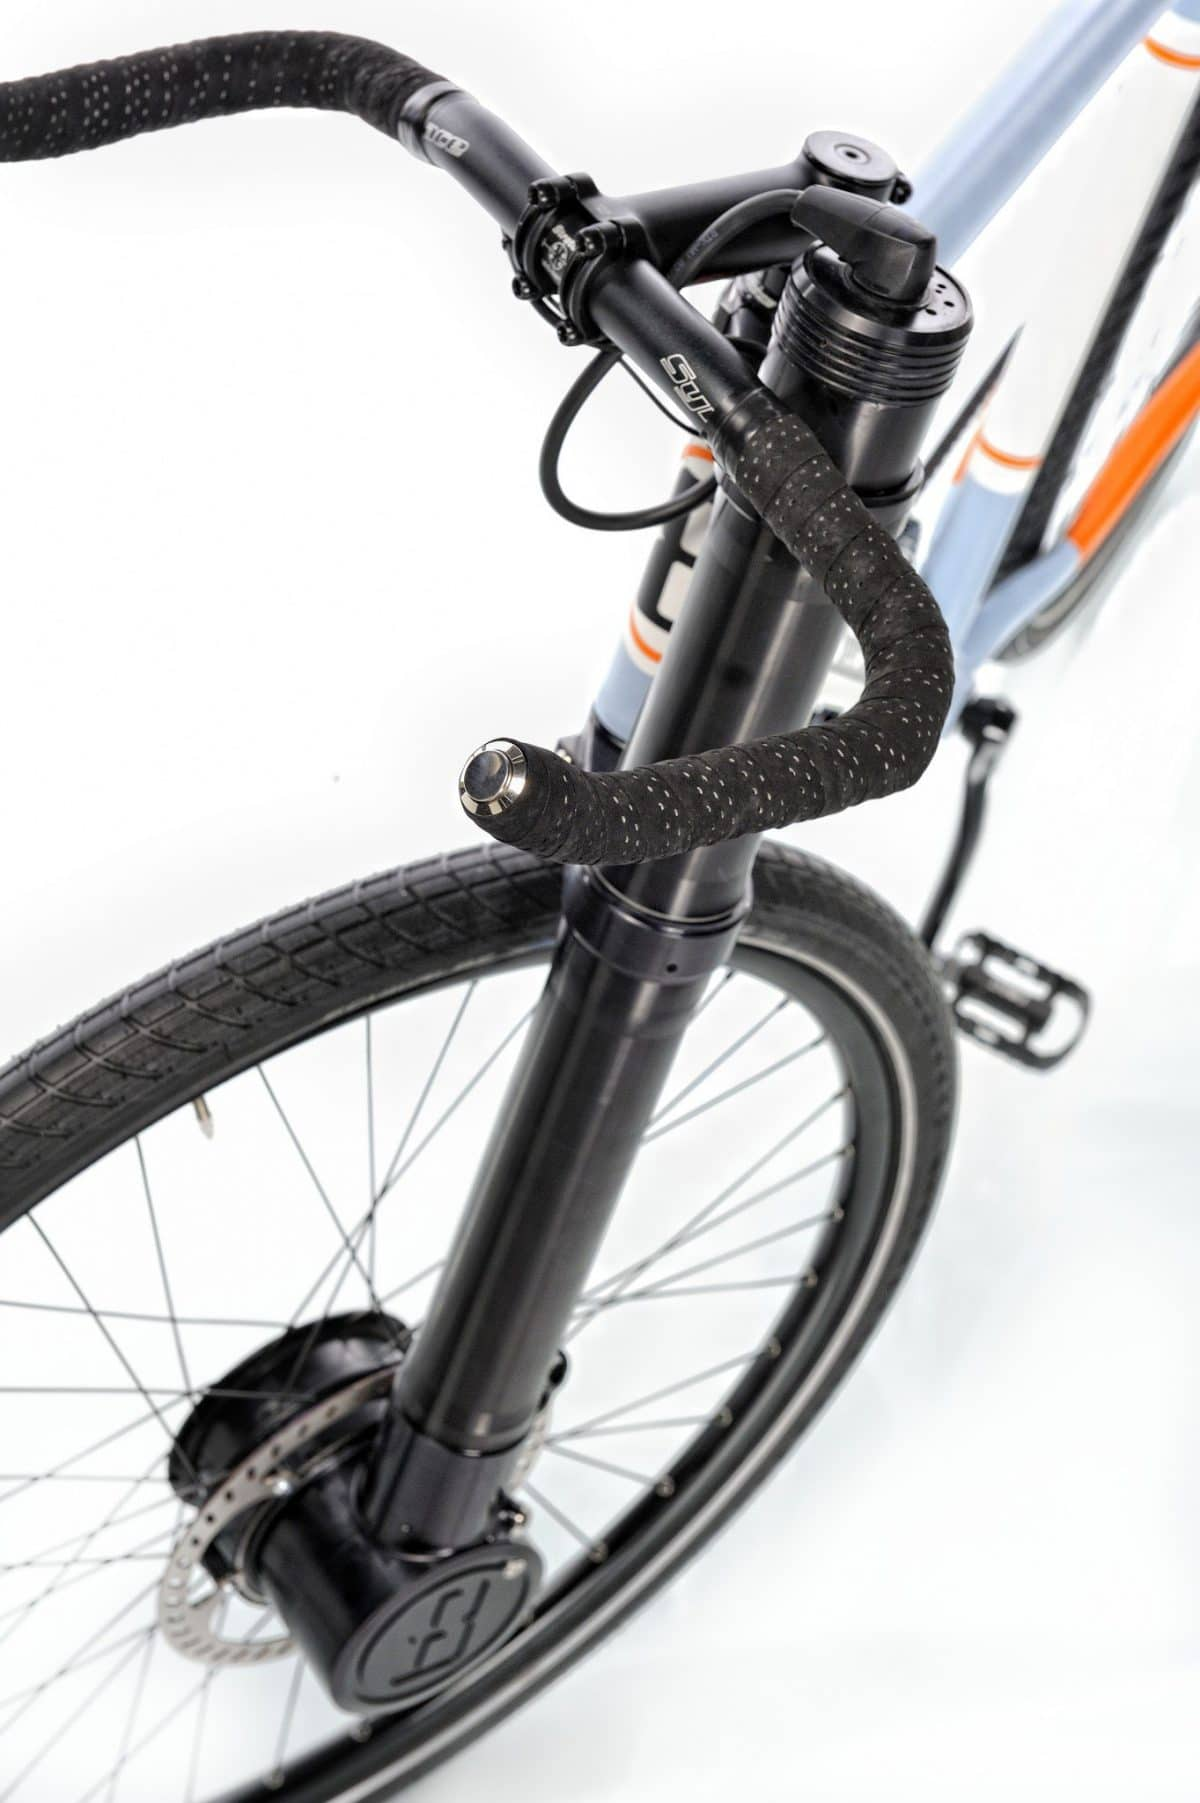 electrolyte stra enfeger ii urbanes lifestyle e bike wiegt unter 16 kg ebike. Black Bedroom Furniture Sets. Home Design Ideas